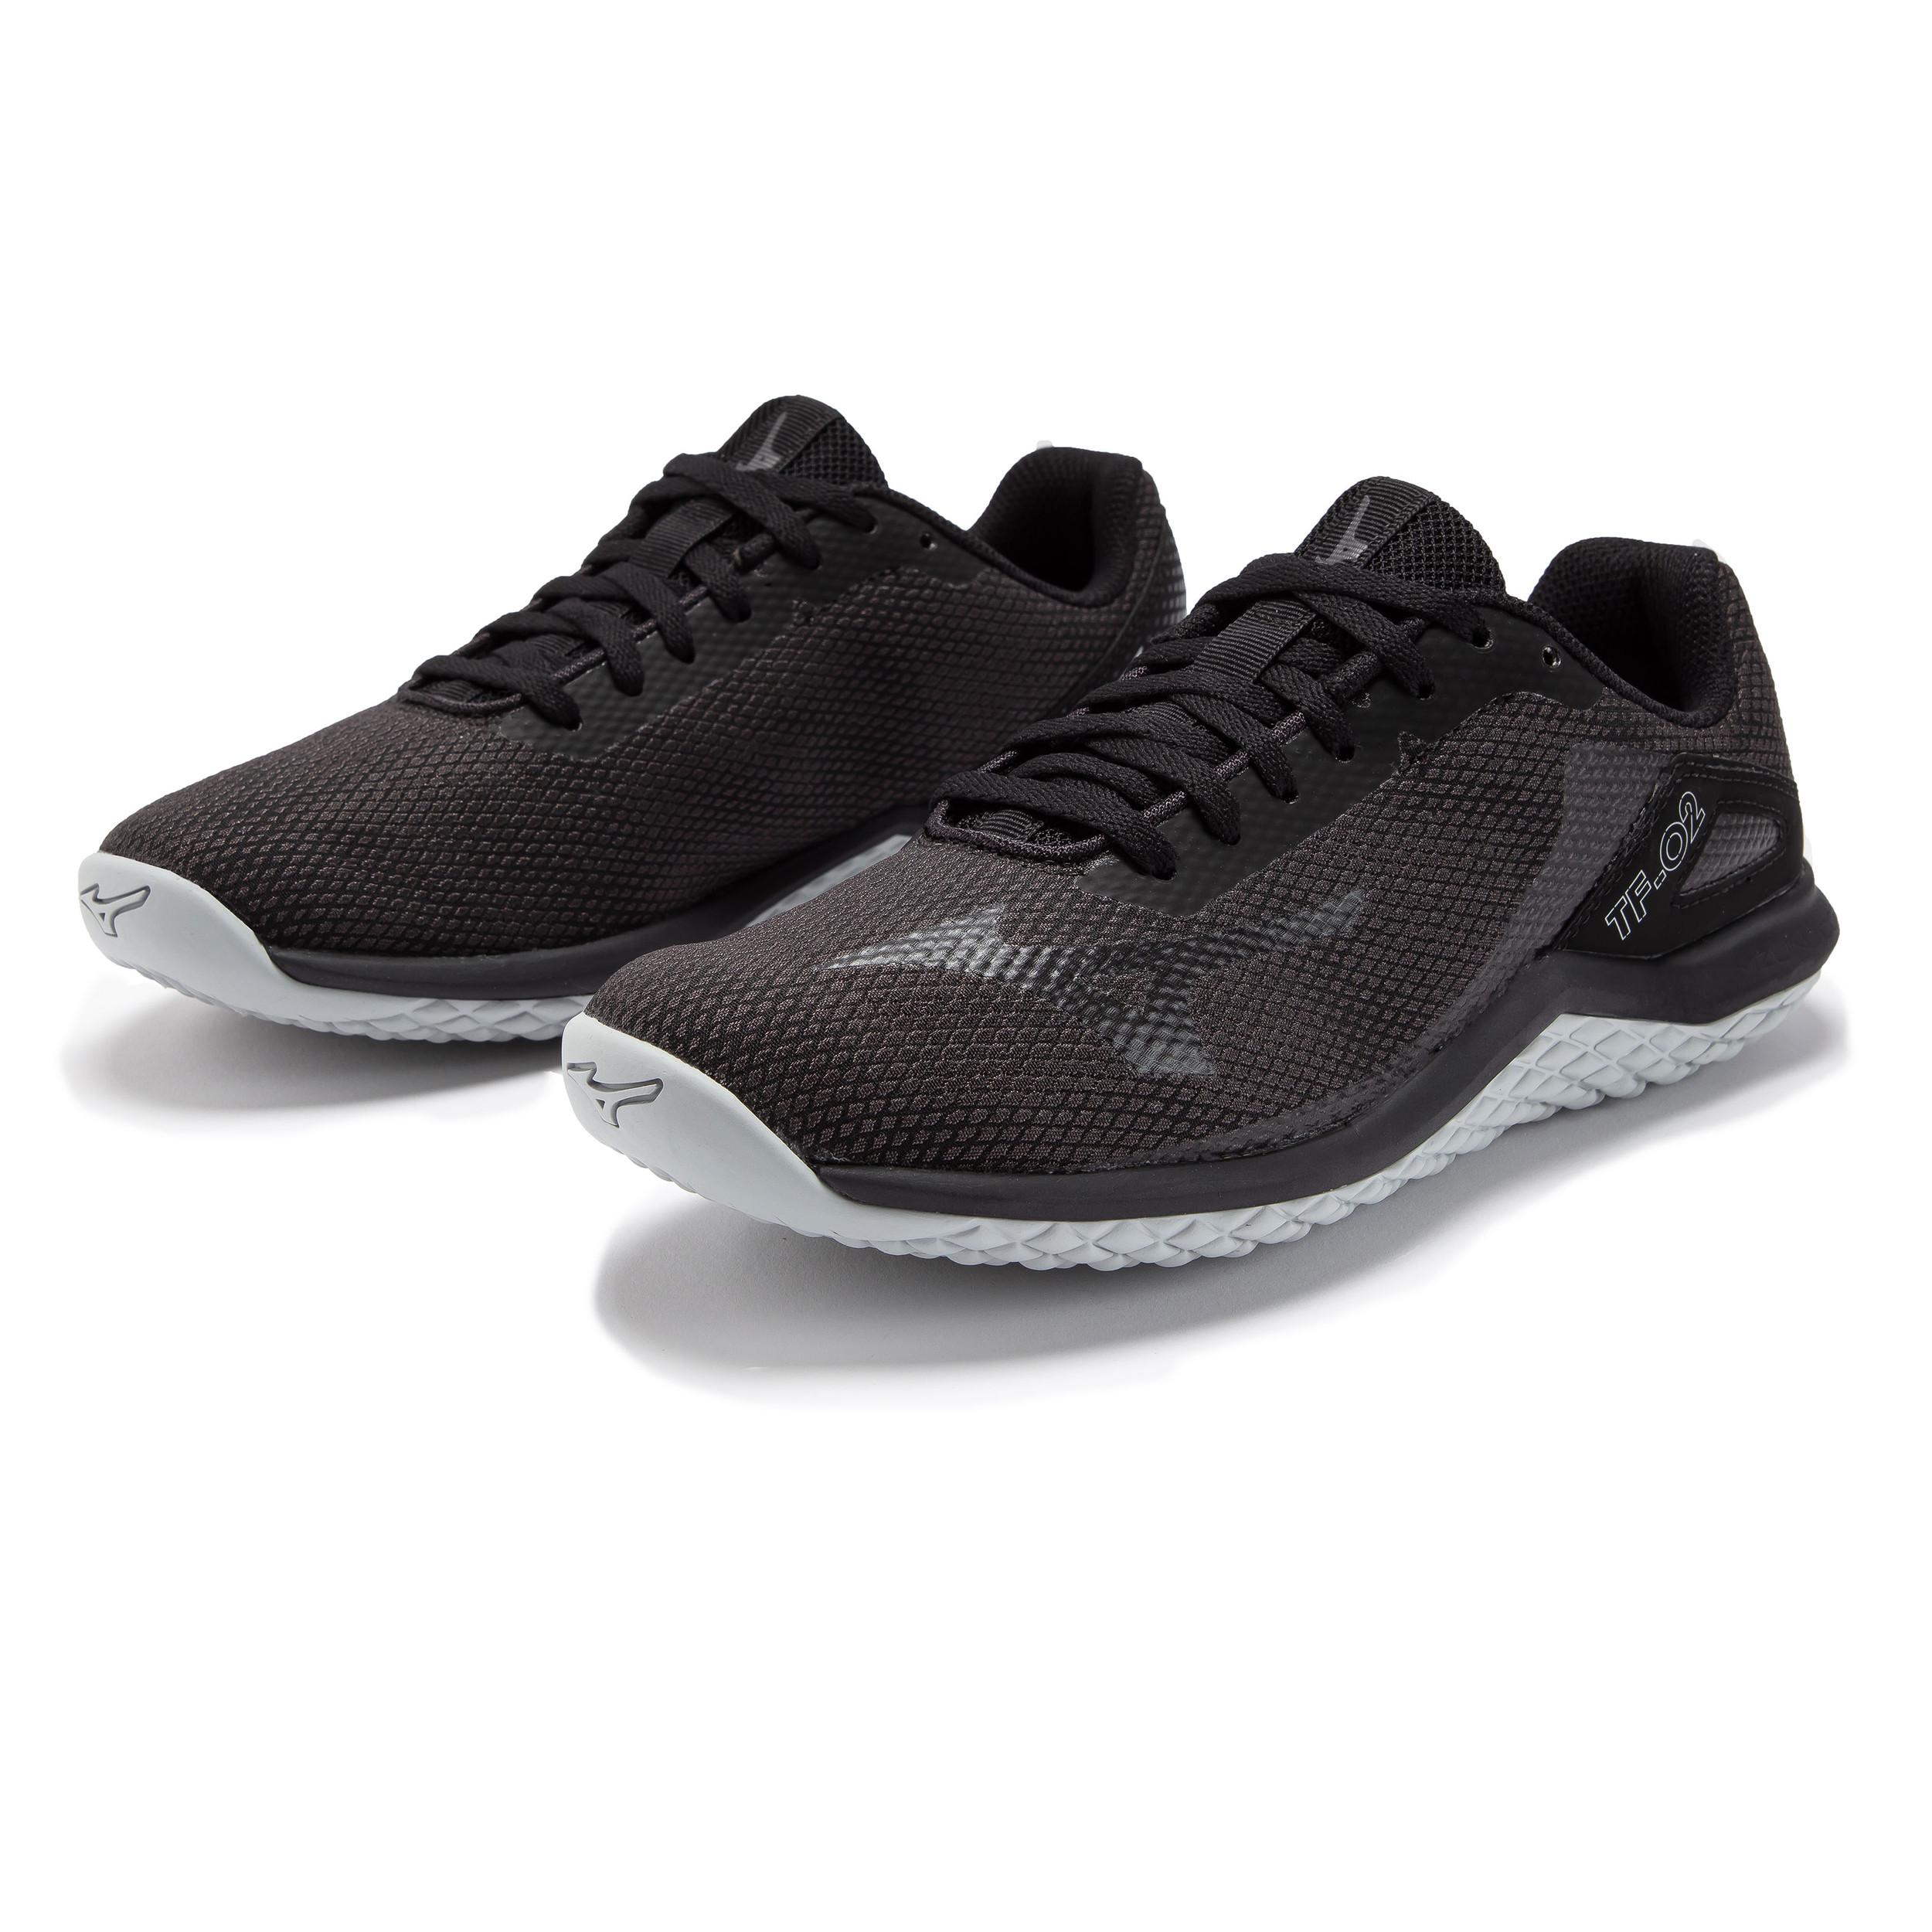 Mizuno TF-02 Women's Running Shoes - AW20